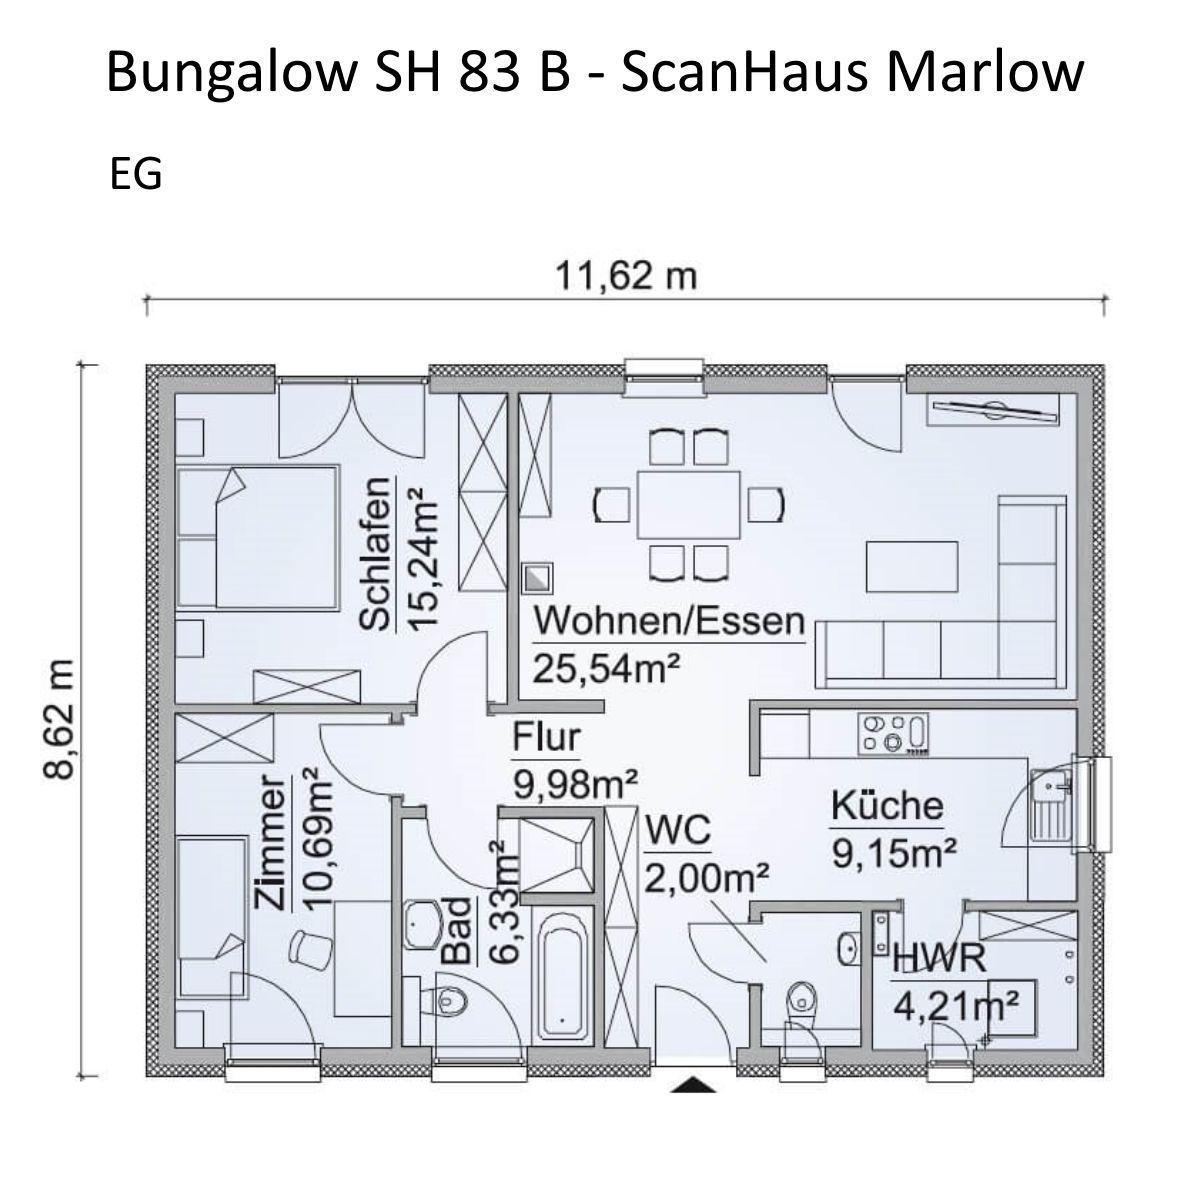 Bungalow Haus Grundriss Erdgeschoss ebenerdig, 3 Zimmer